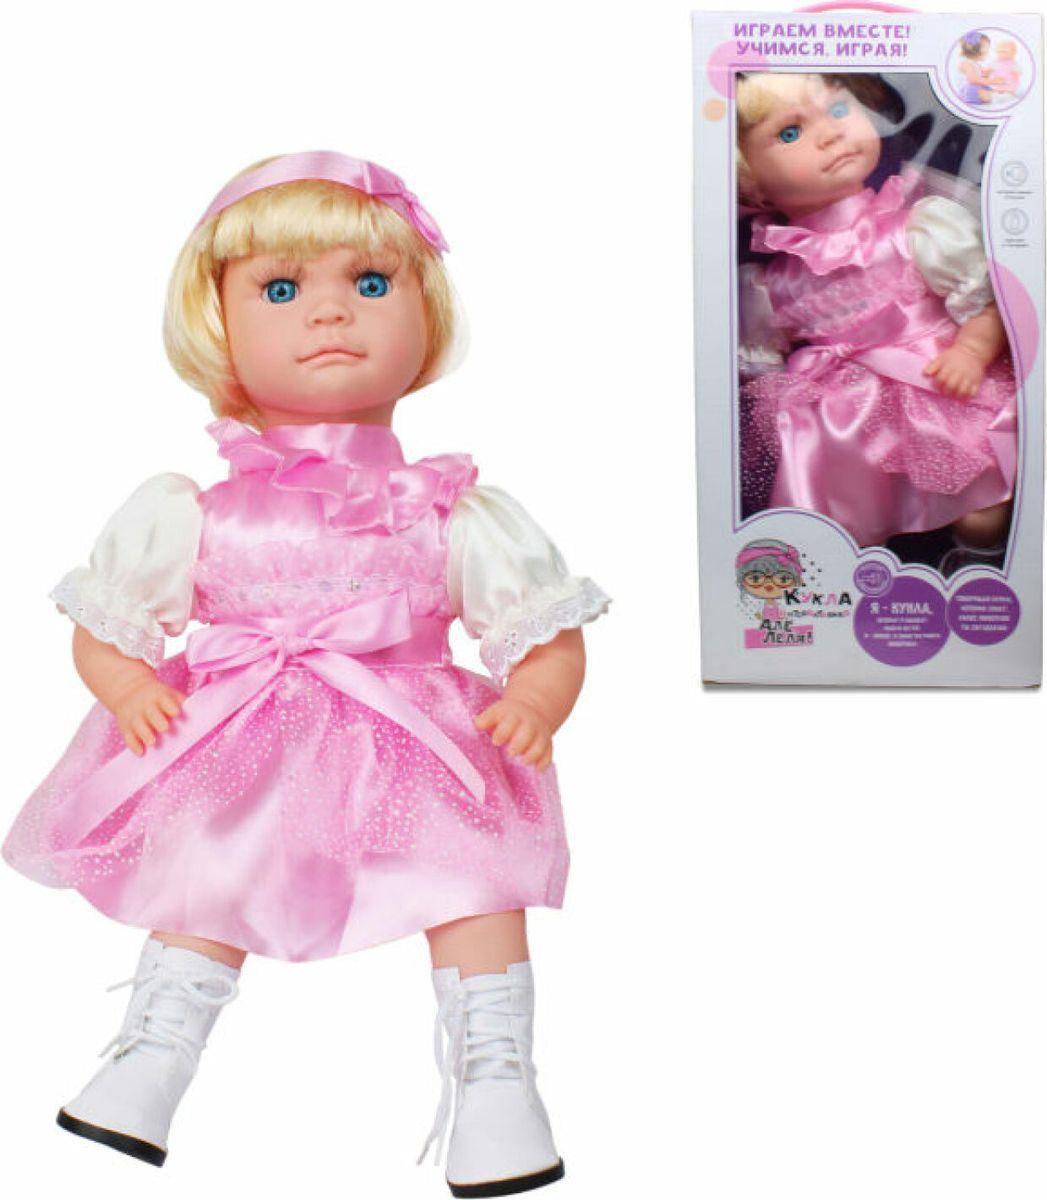 Интерактивная игрушка 1TOY Кукла Але, Леля! блондинка с каре, Т14354